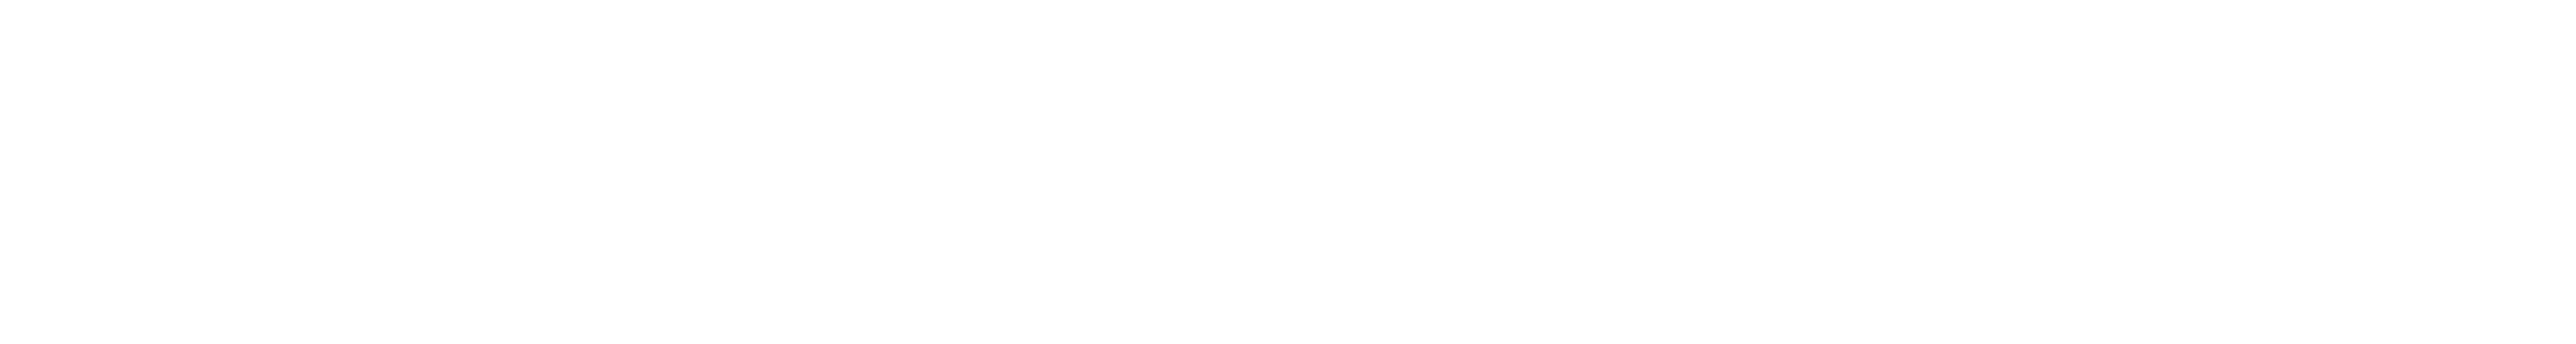 WG-Gesucht.de logo